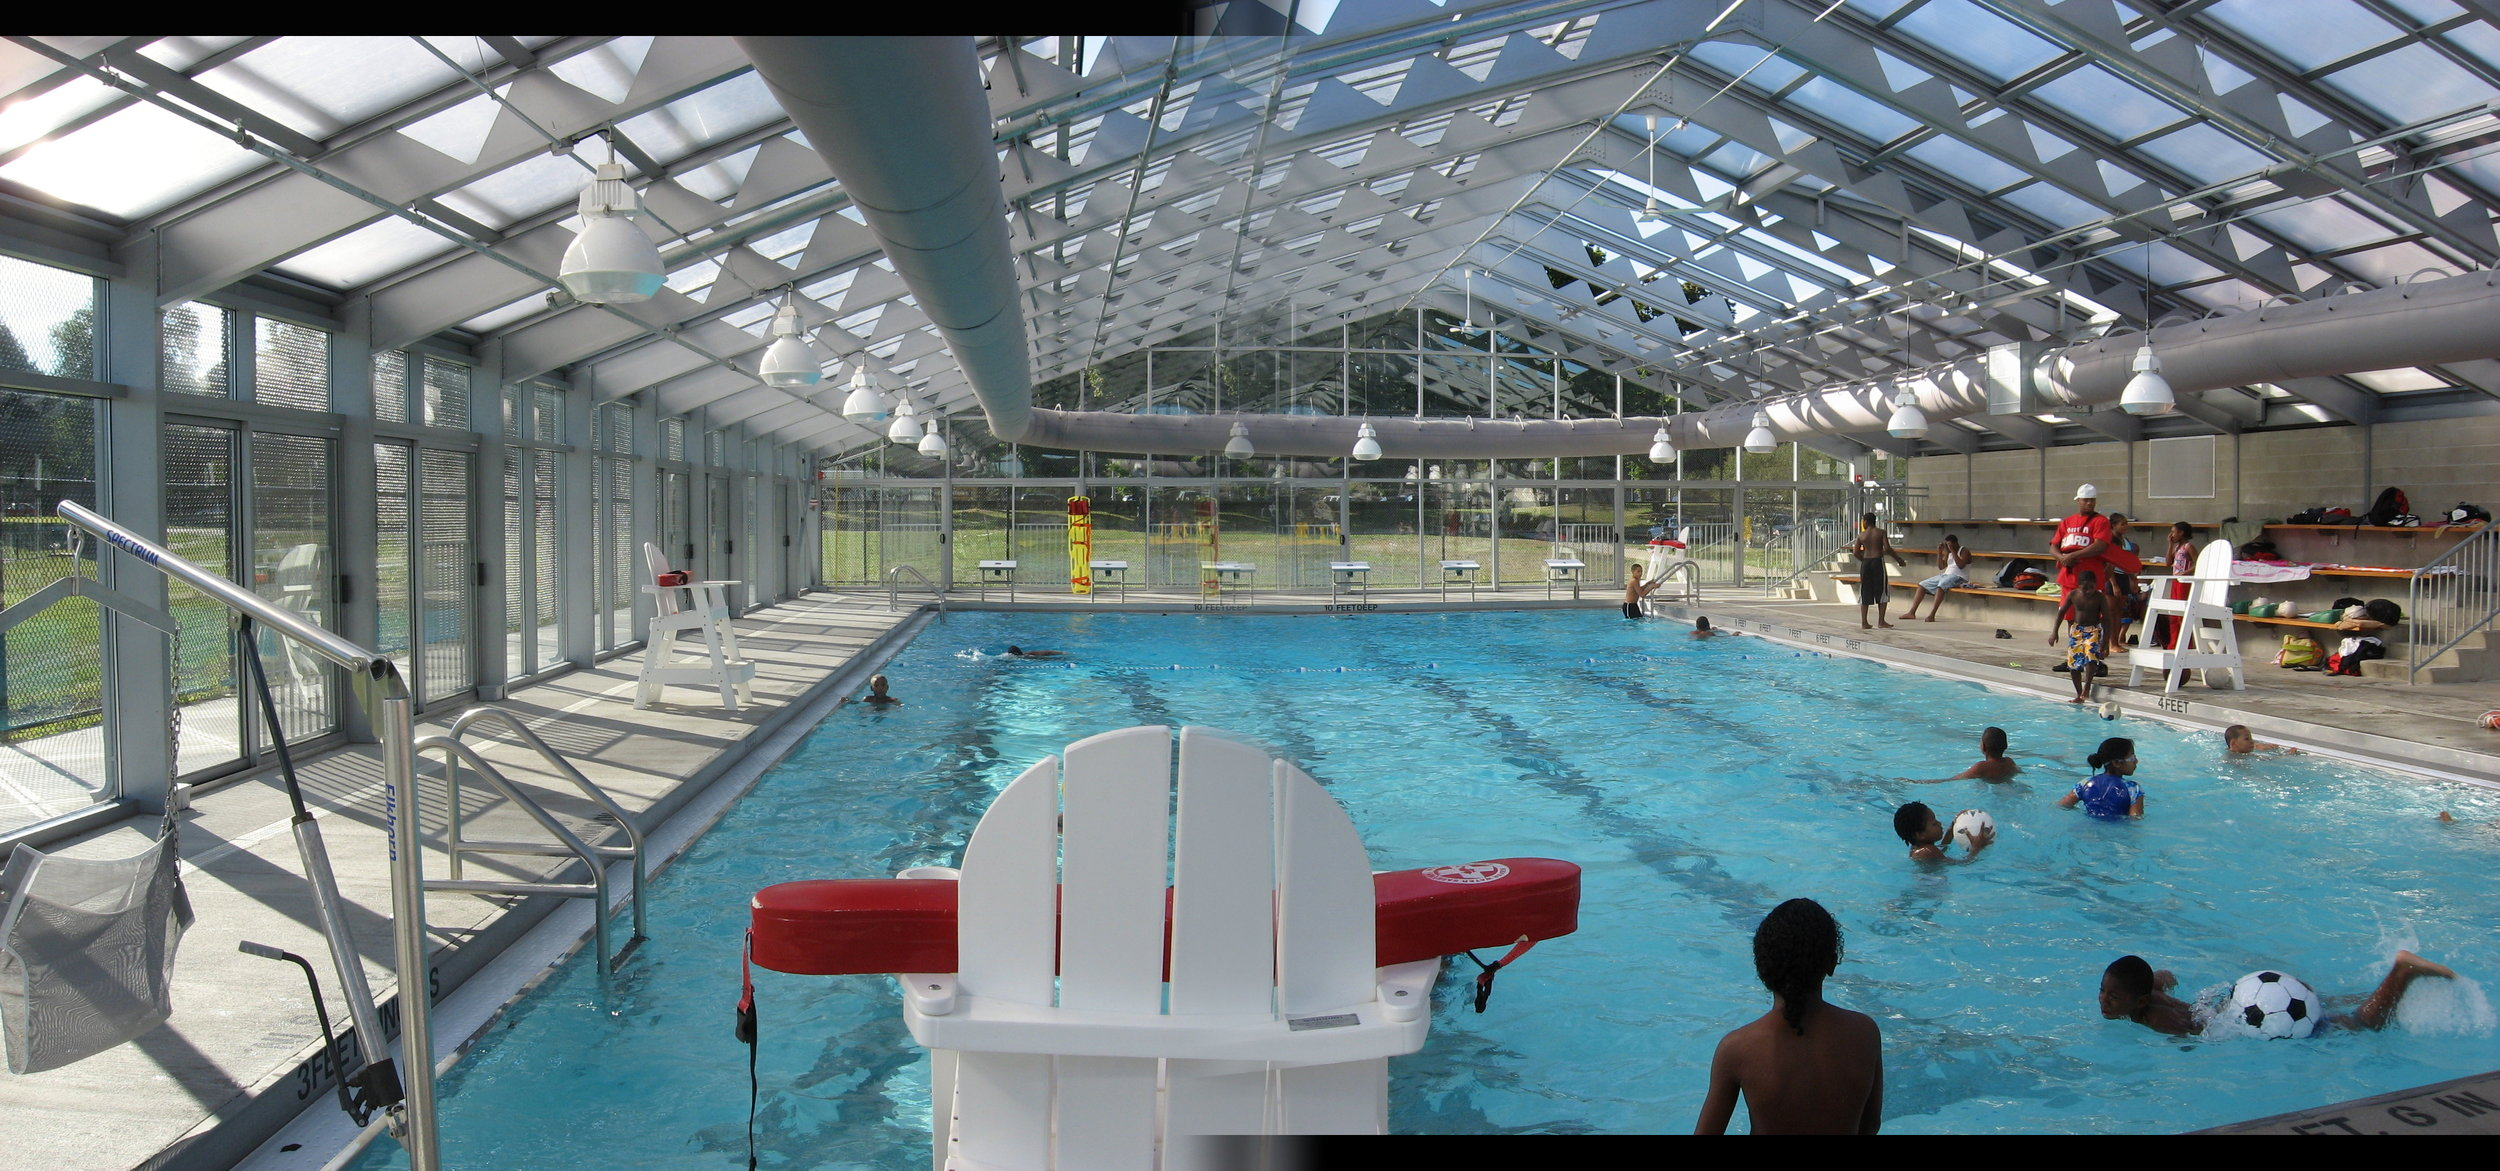 Pool at Blue Hills BGC 3.jpg